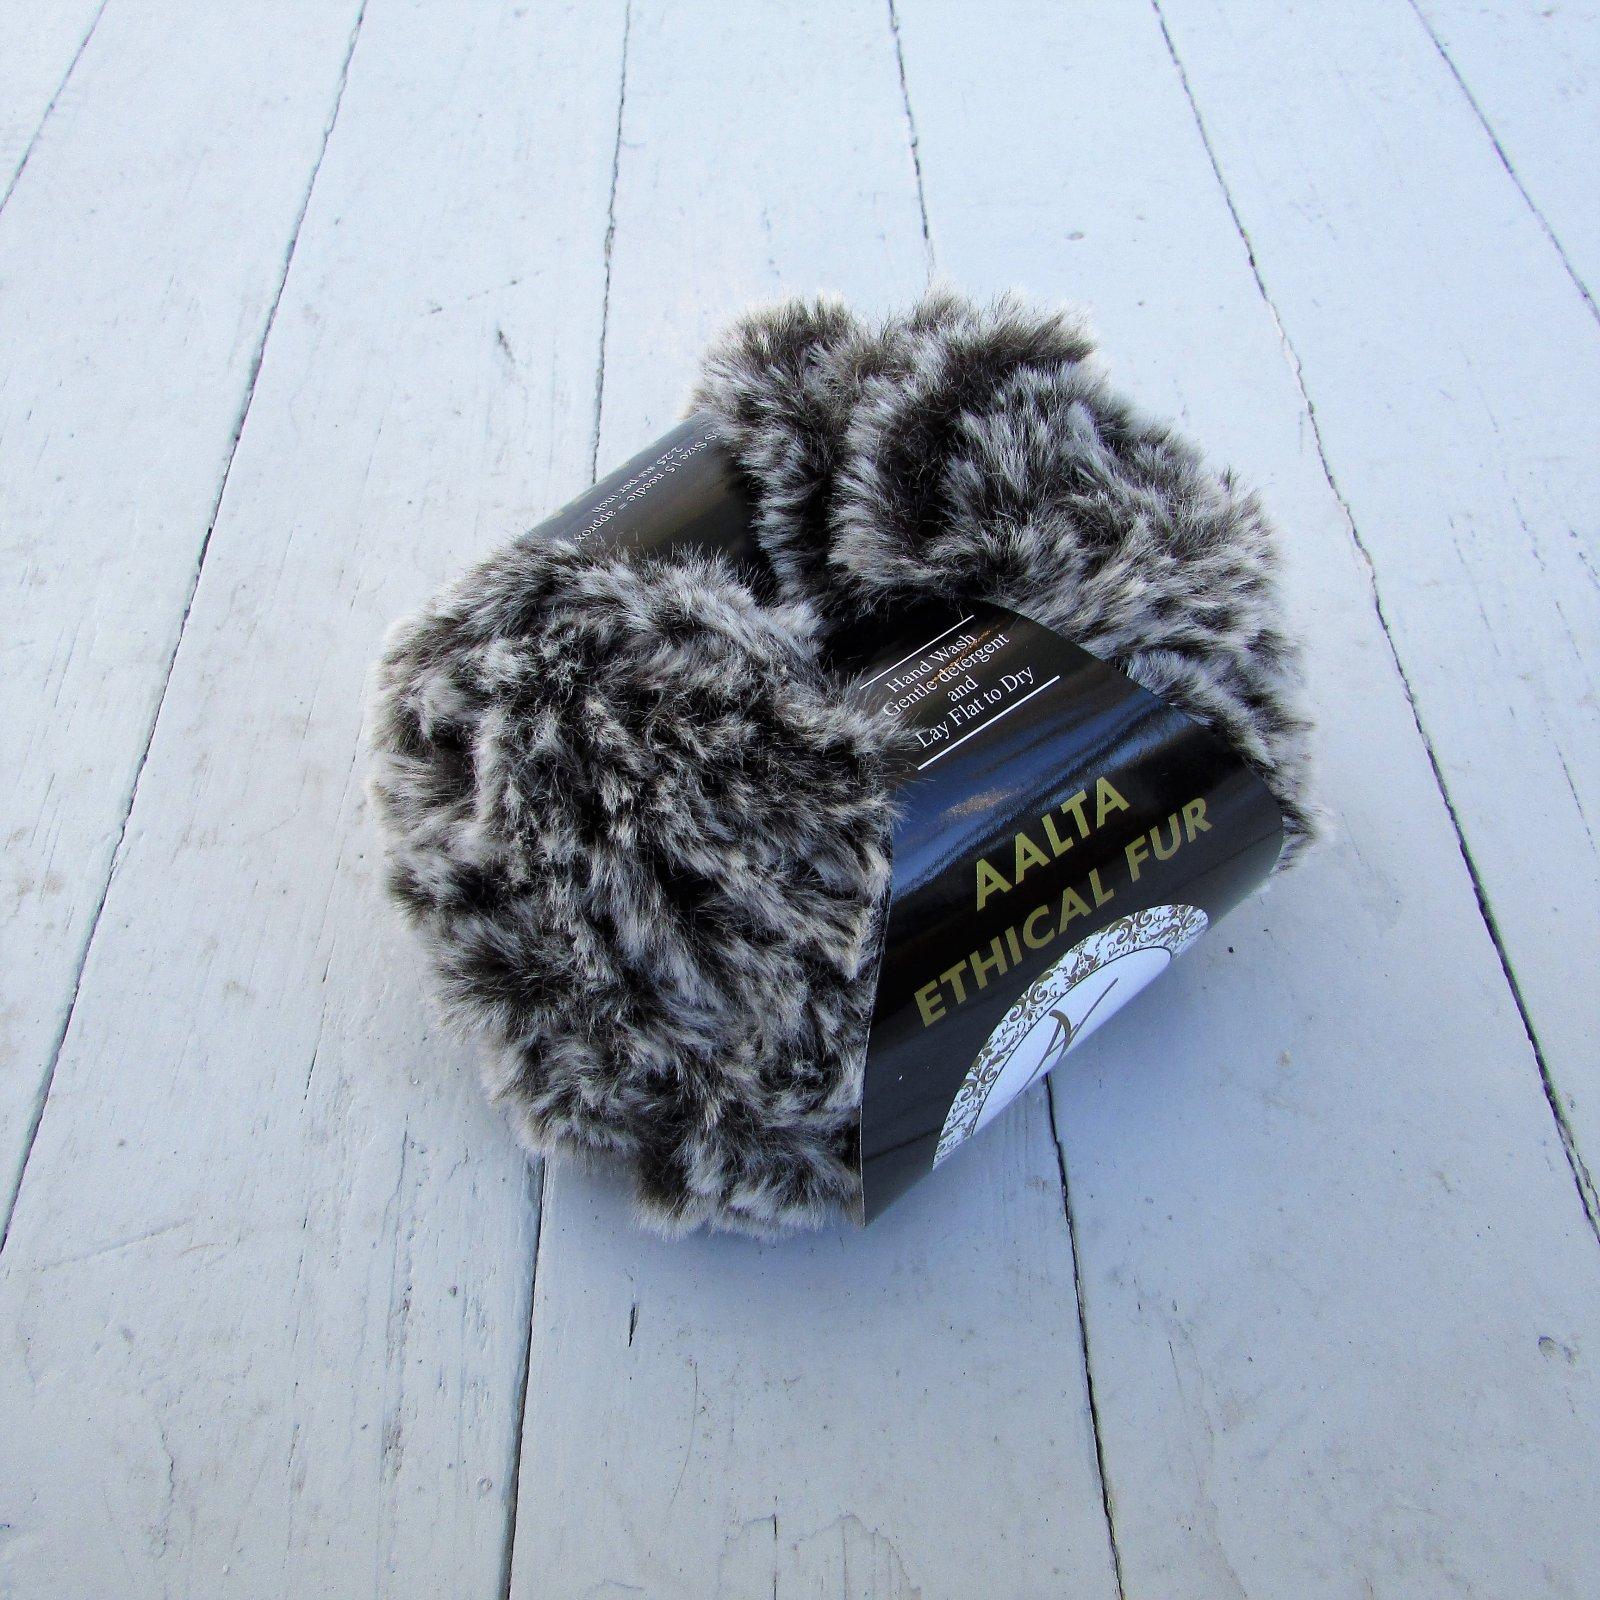 Aalta Ethical Fur